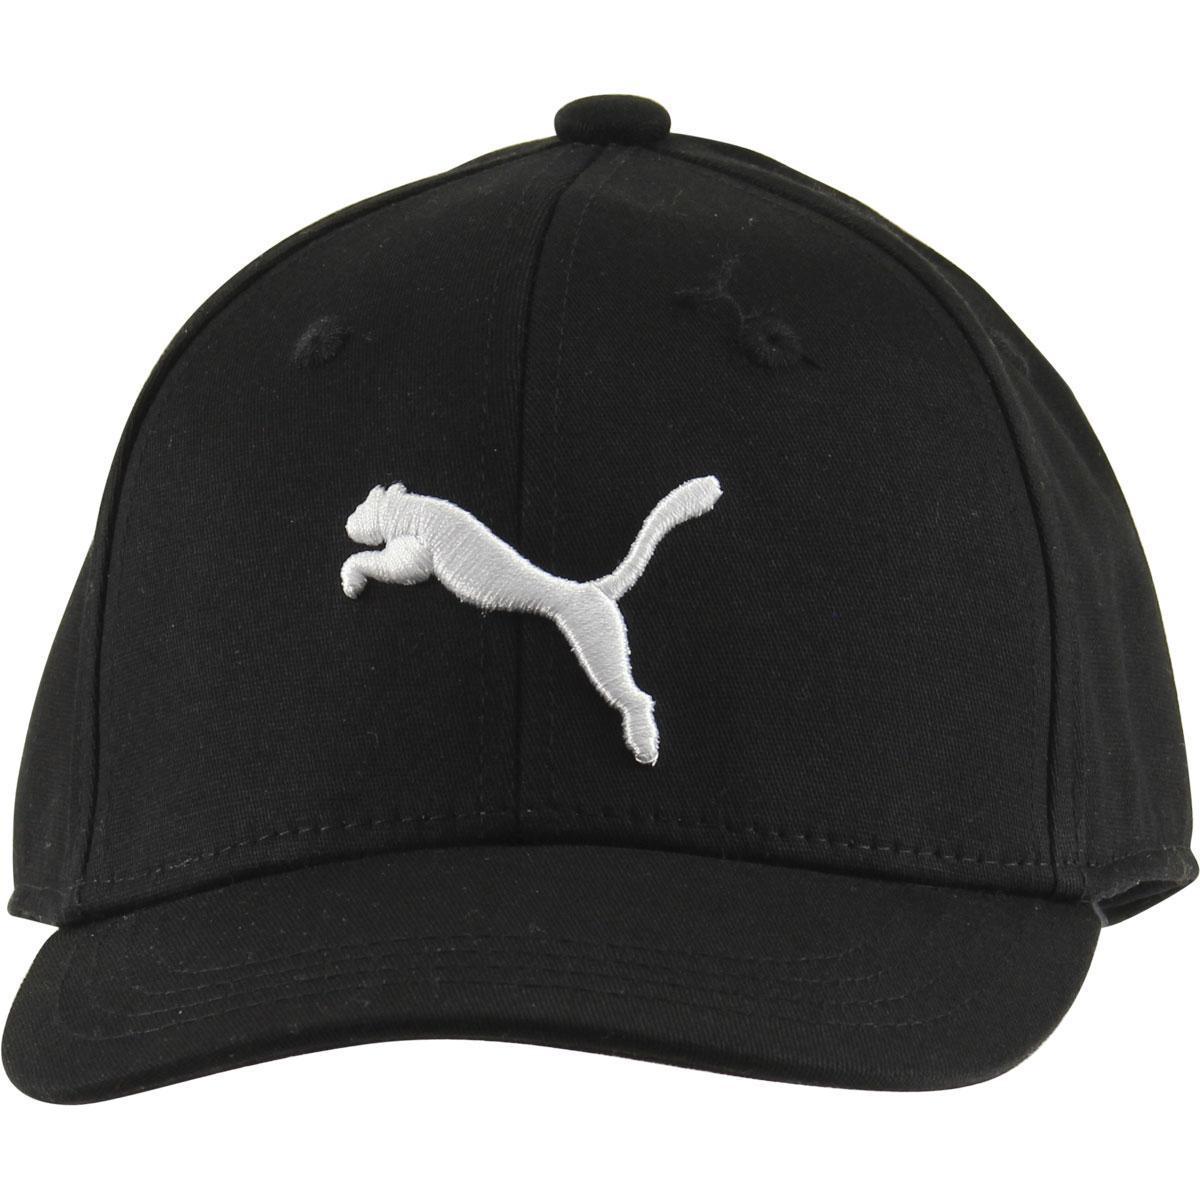 Puma Boy s Youth Evercat Anthem Stretch Fit Baseball Cap Hat 967f43cd5a8